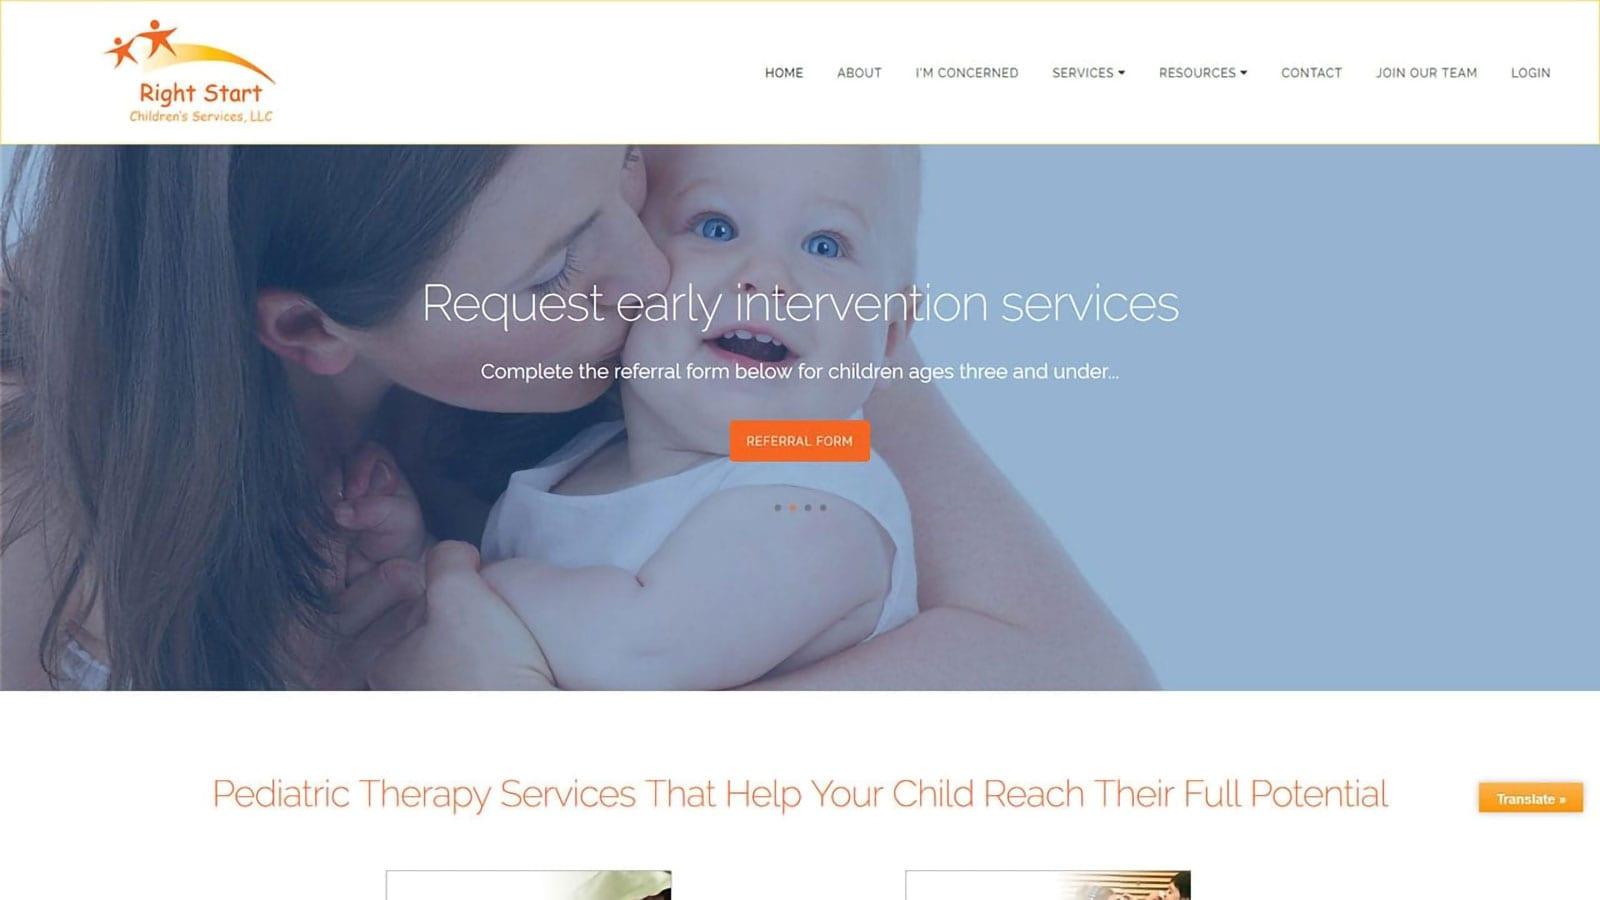 Right Start Children's Services Seeks Digital Marketing Support from DaBrian Marketing